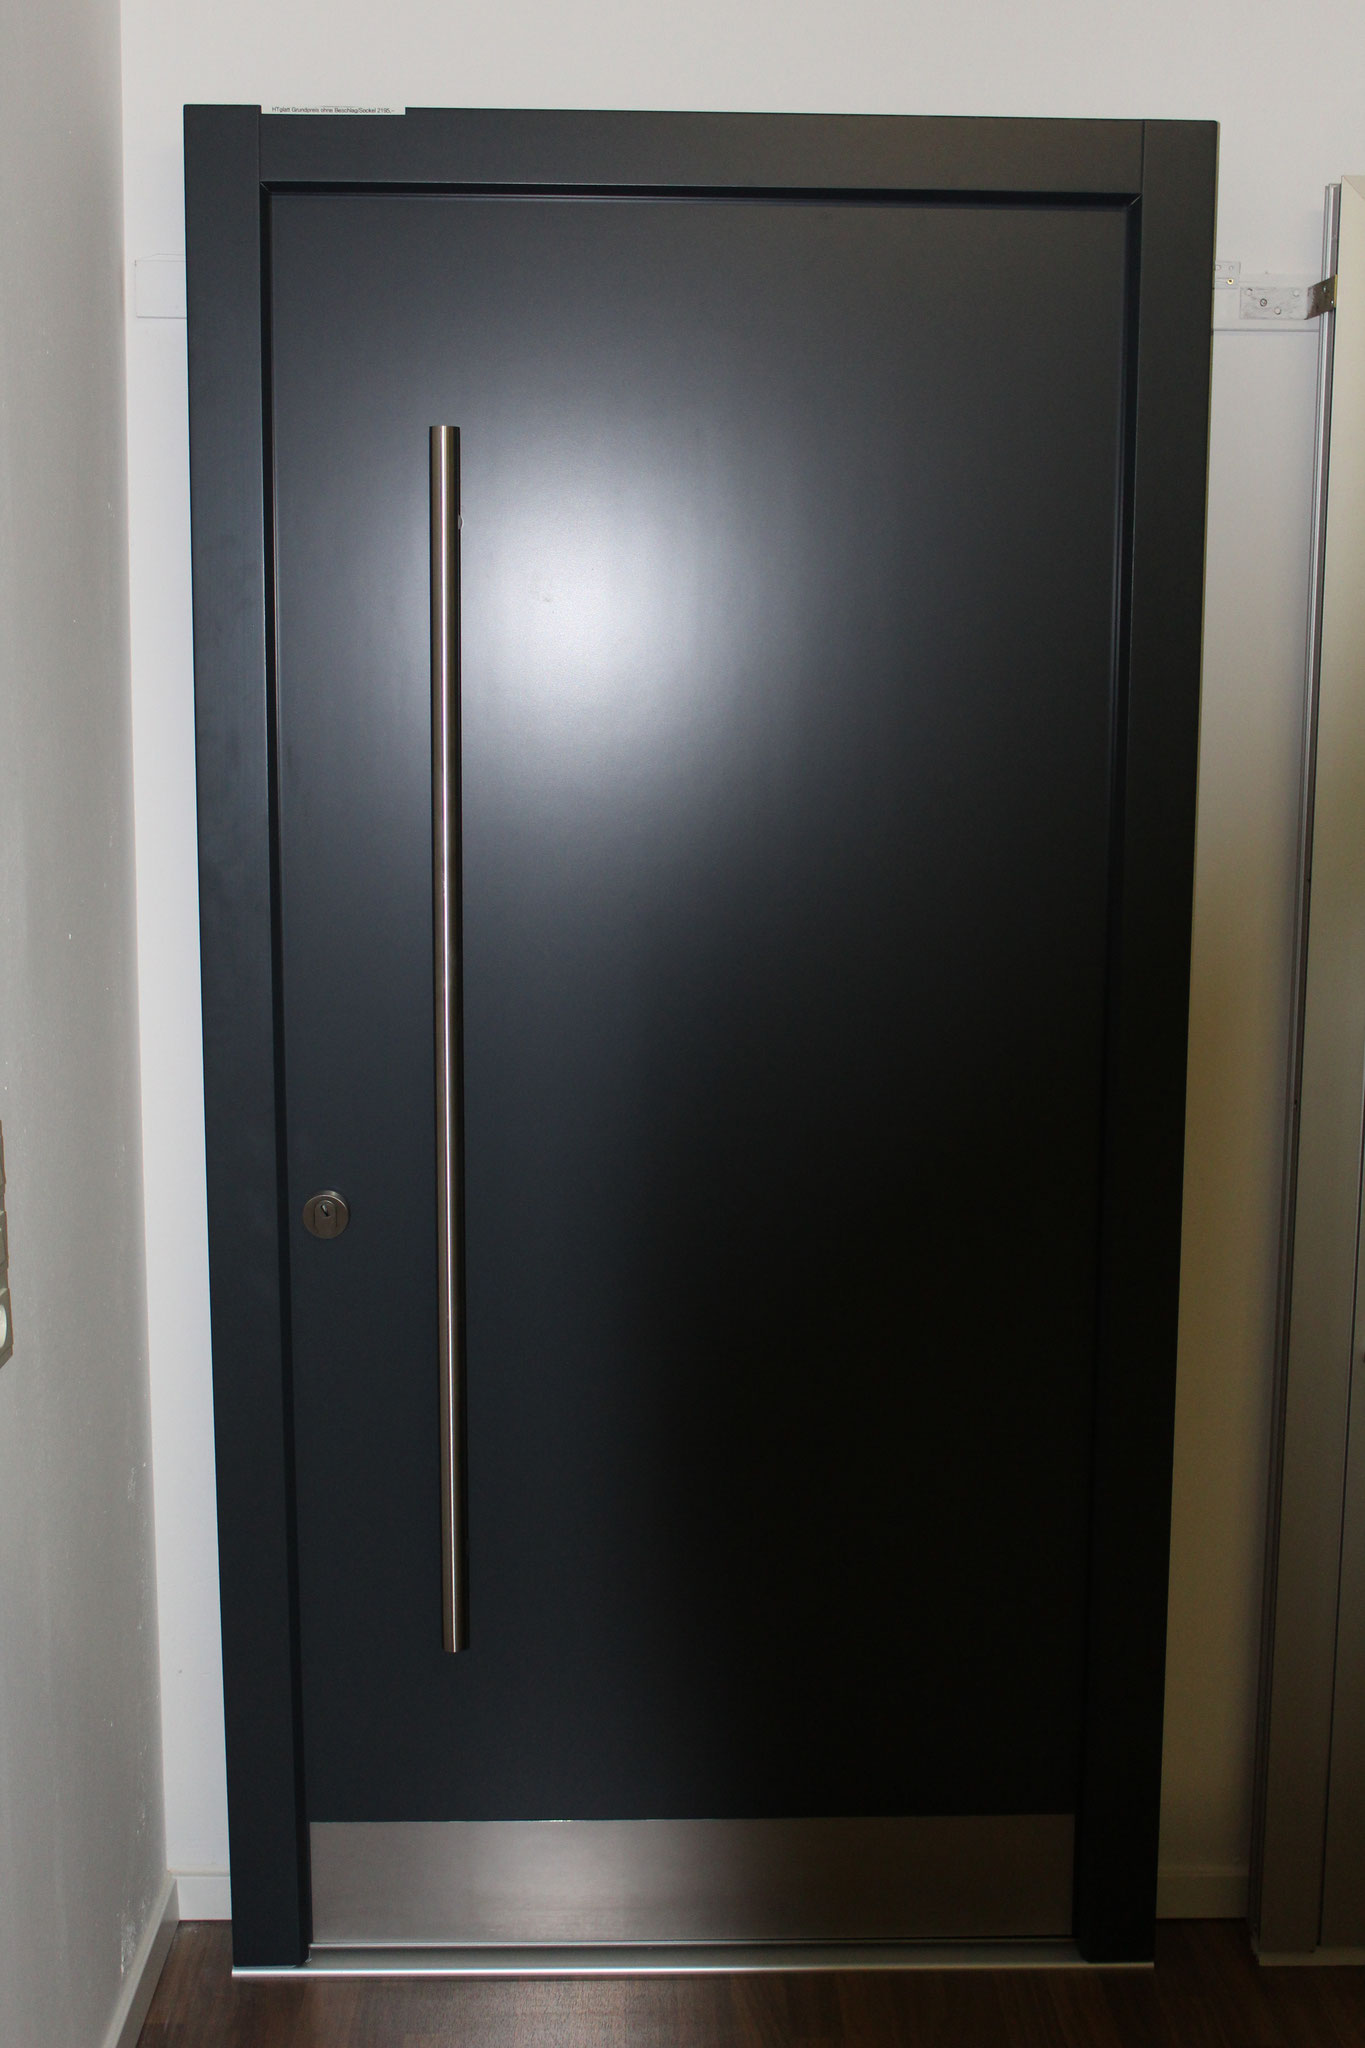 Haustüre 1: 113 x 218 cm